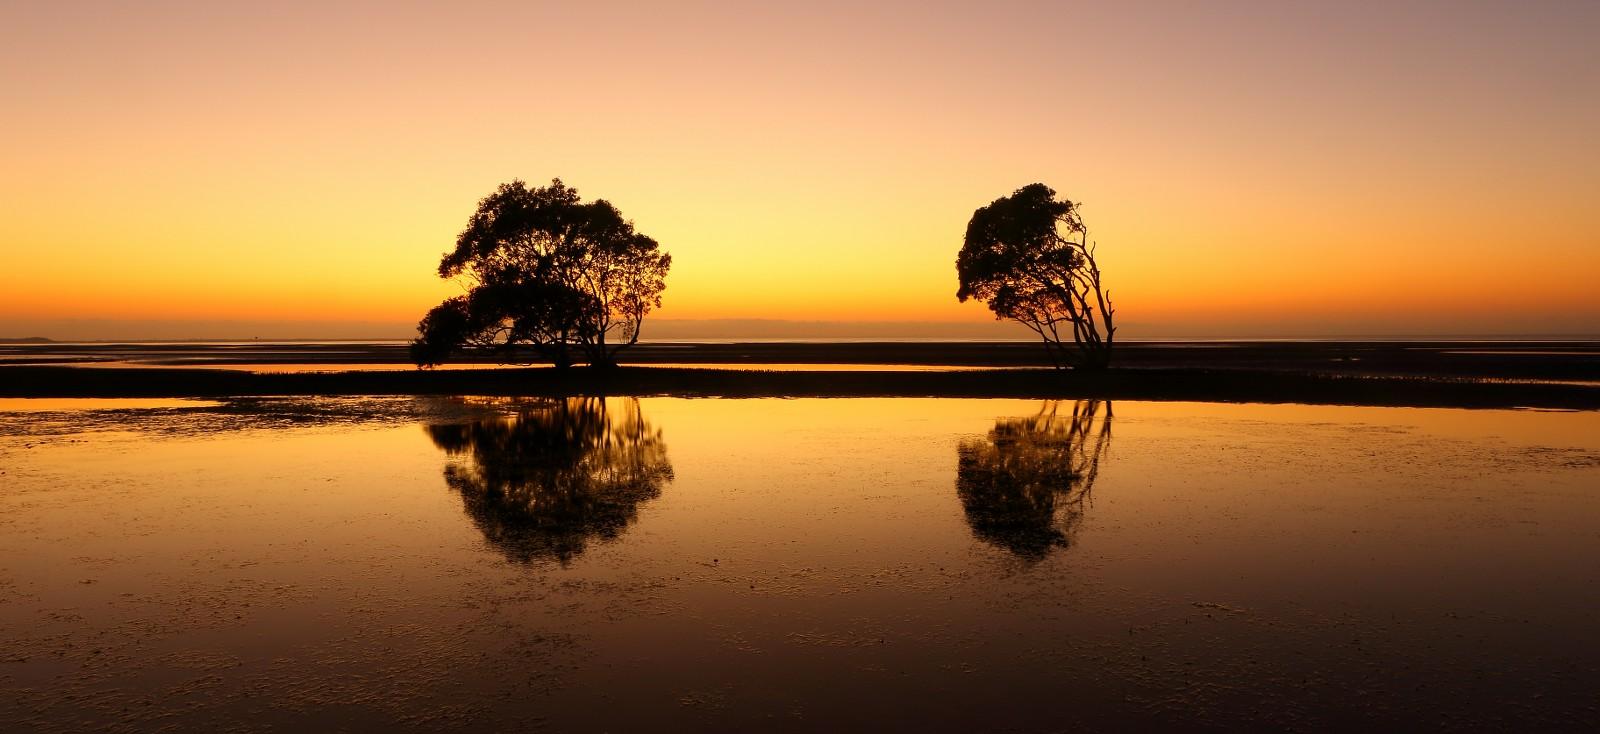 Beachmere, Queensland, Australia